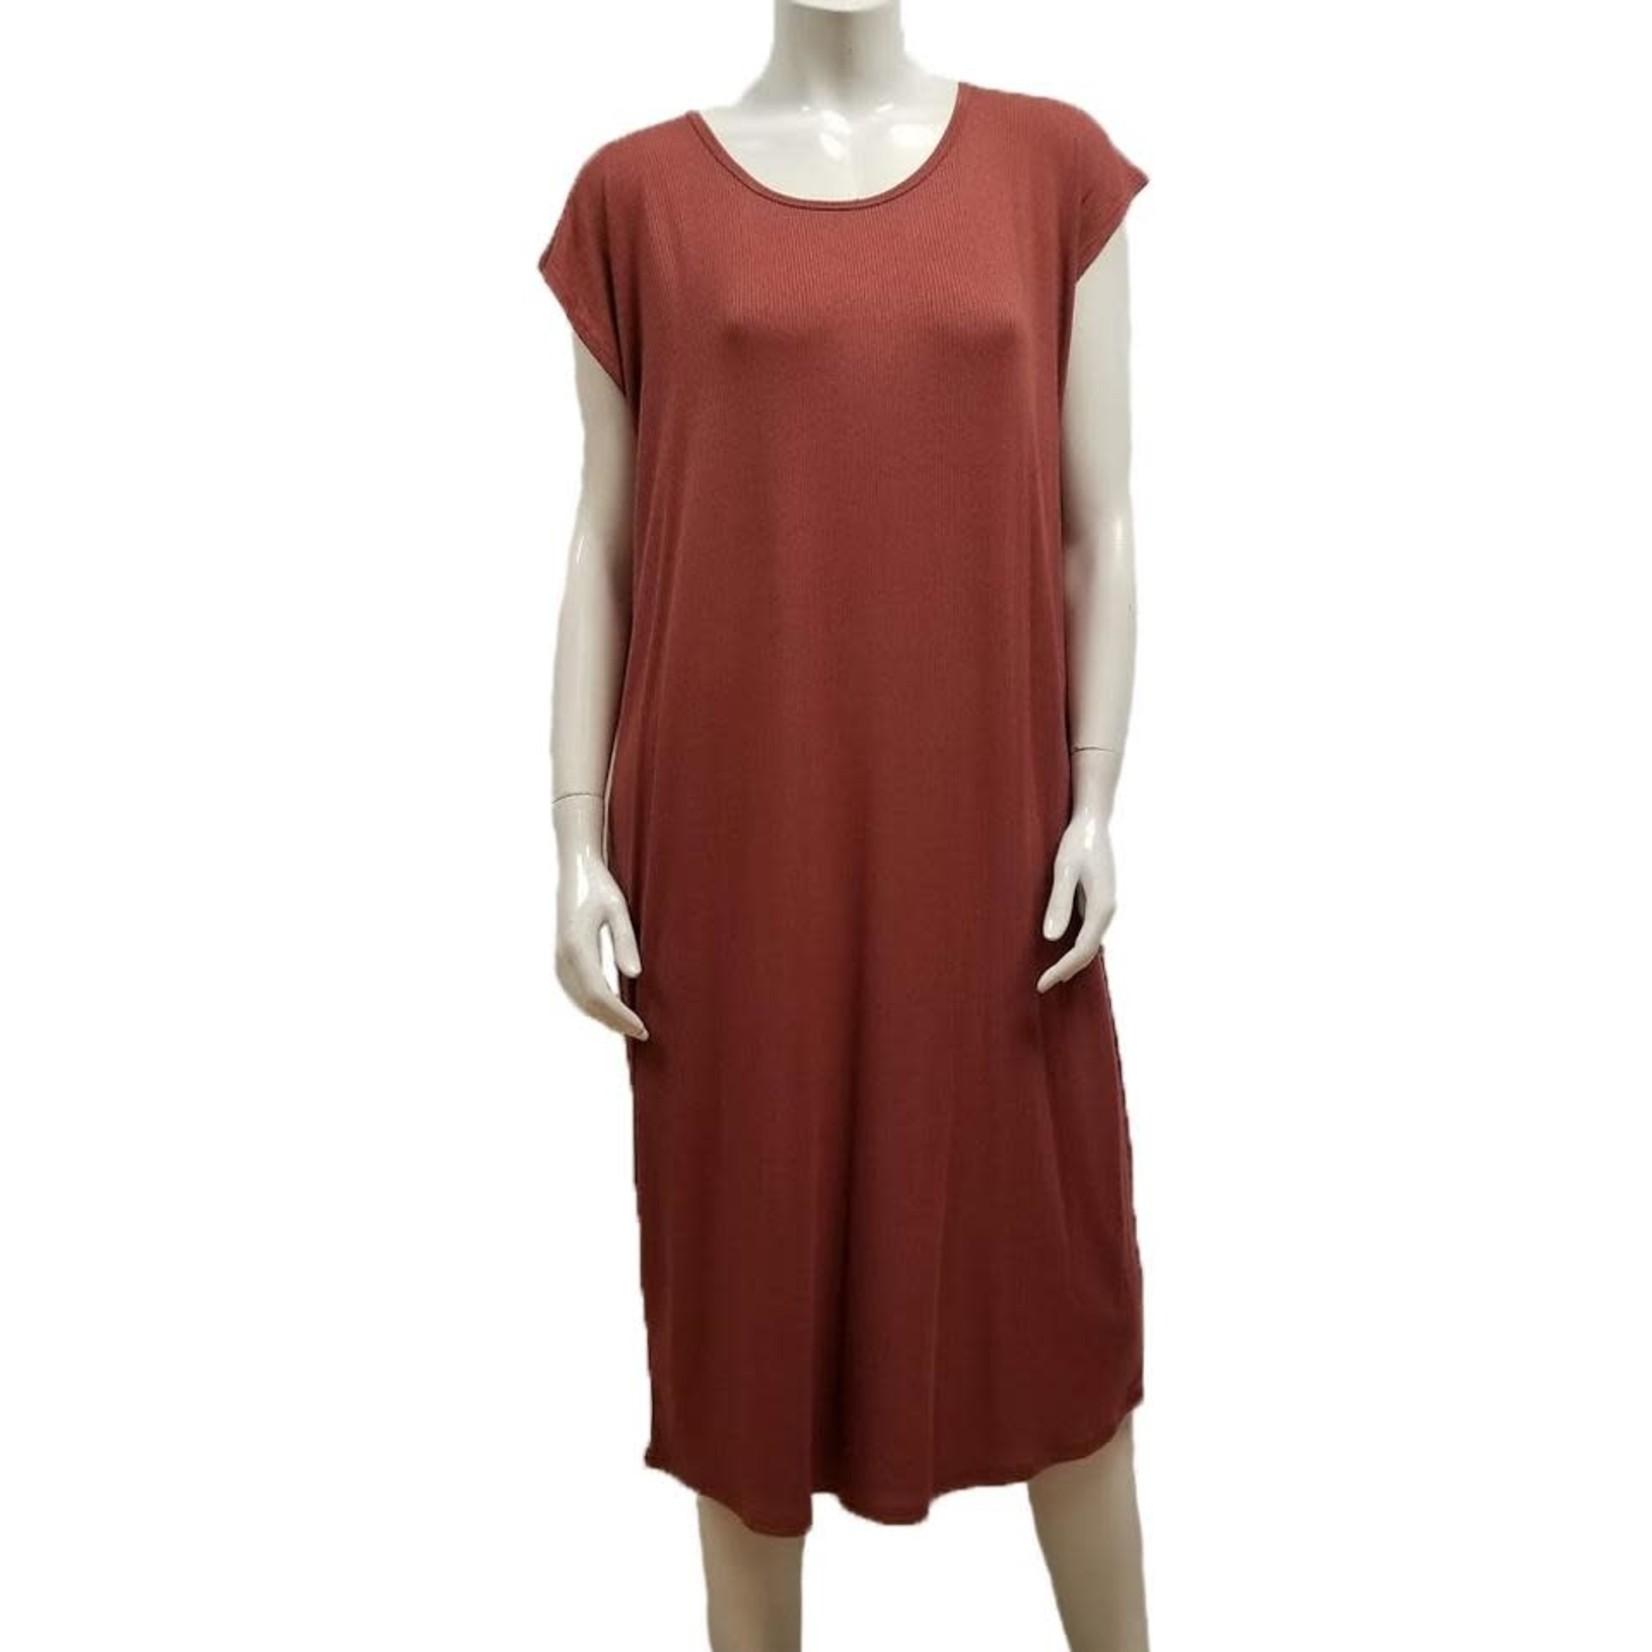 Gilmour Modal Rib Knit Dress